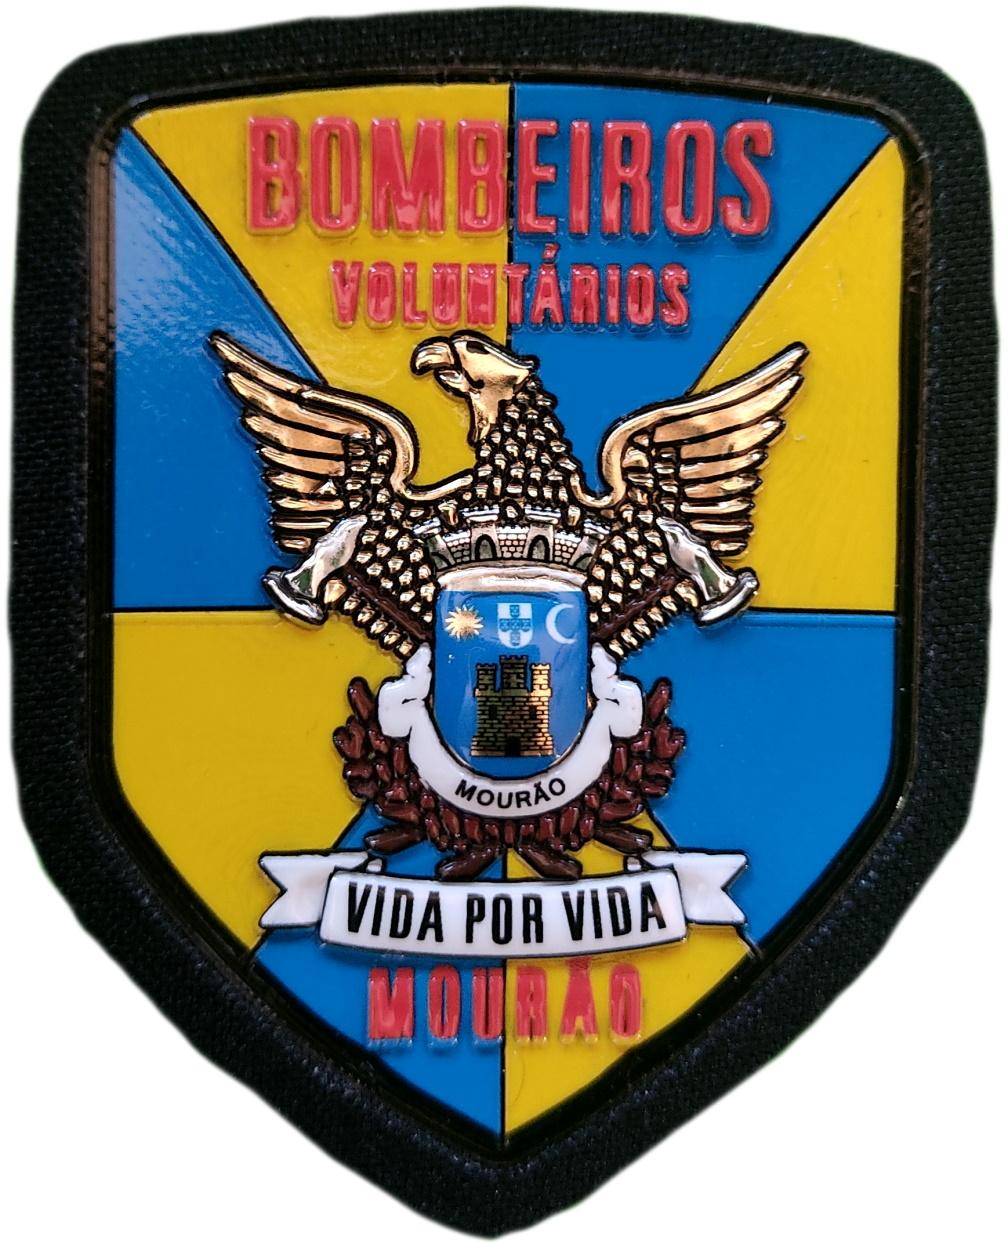 Bomberos Voluntarios Mourao Portugal parche insignia emblema distintivo